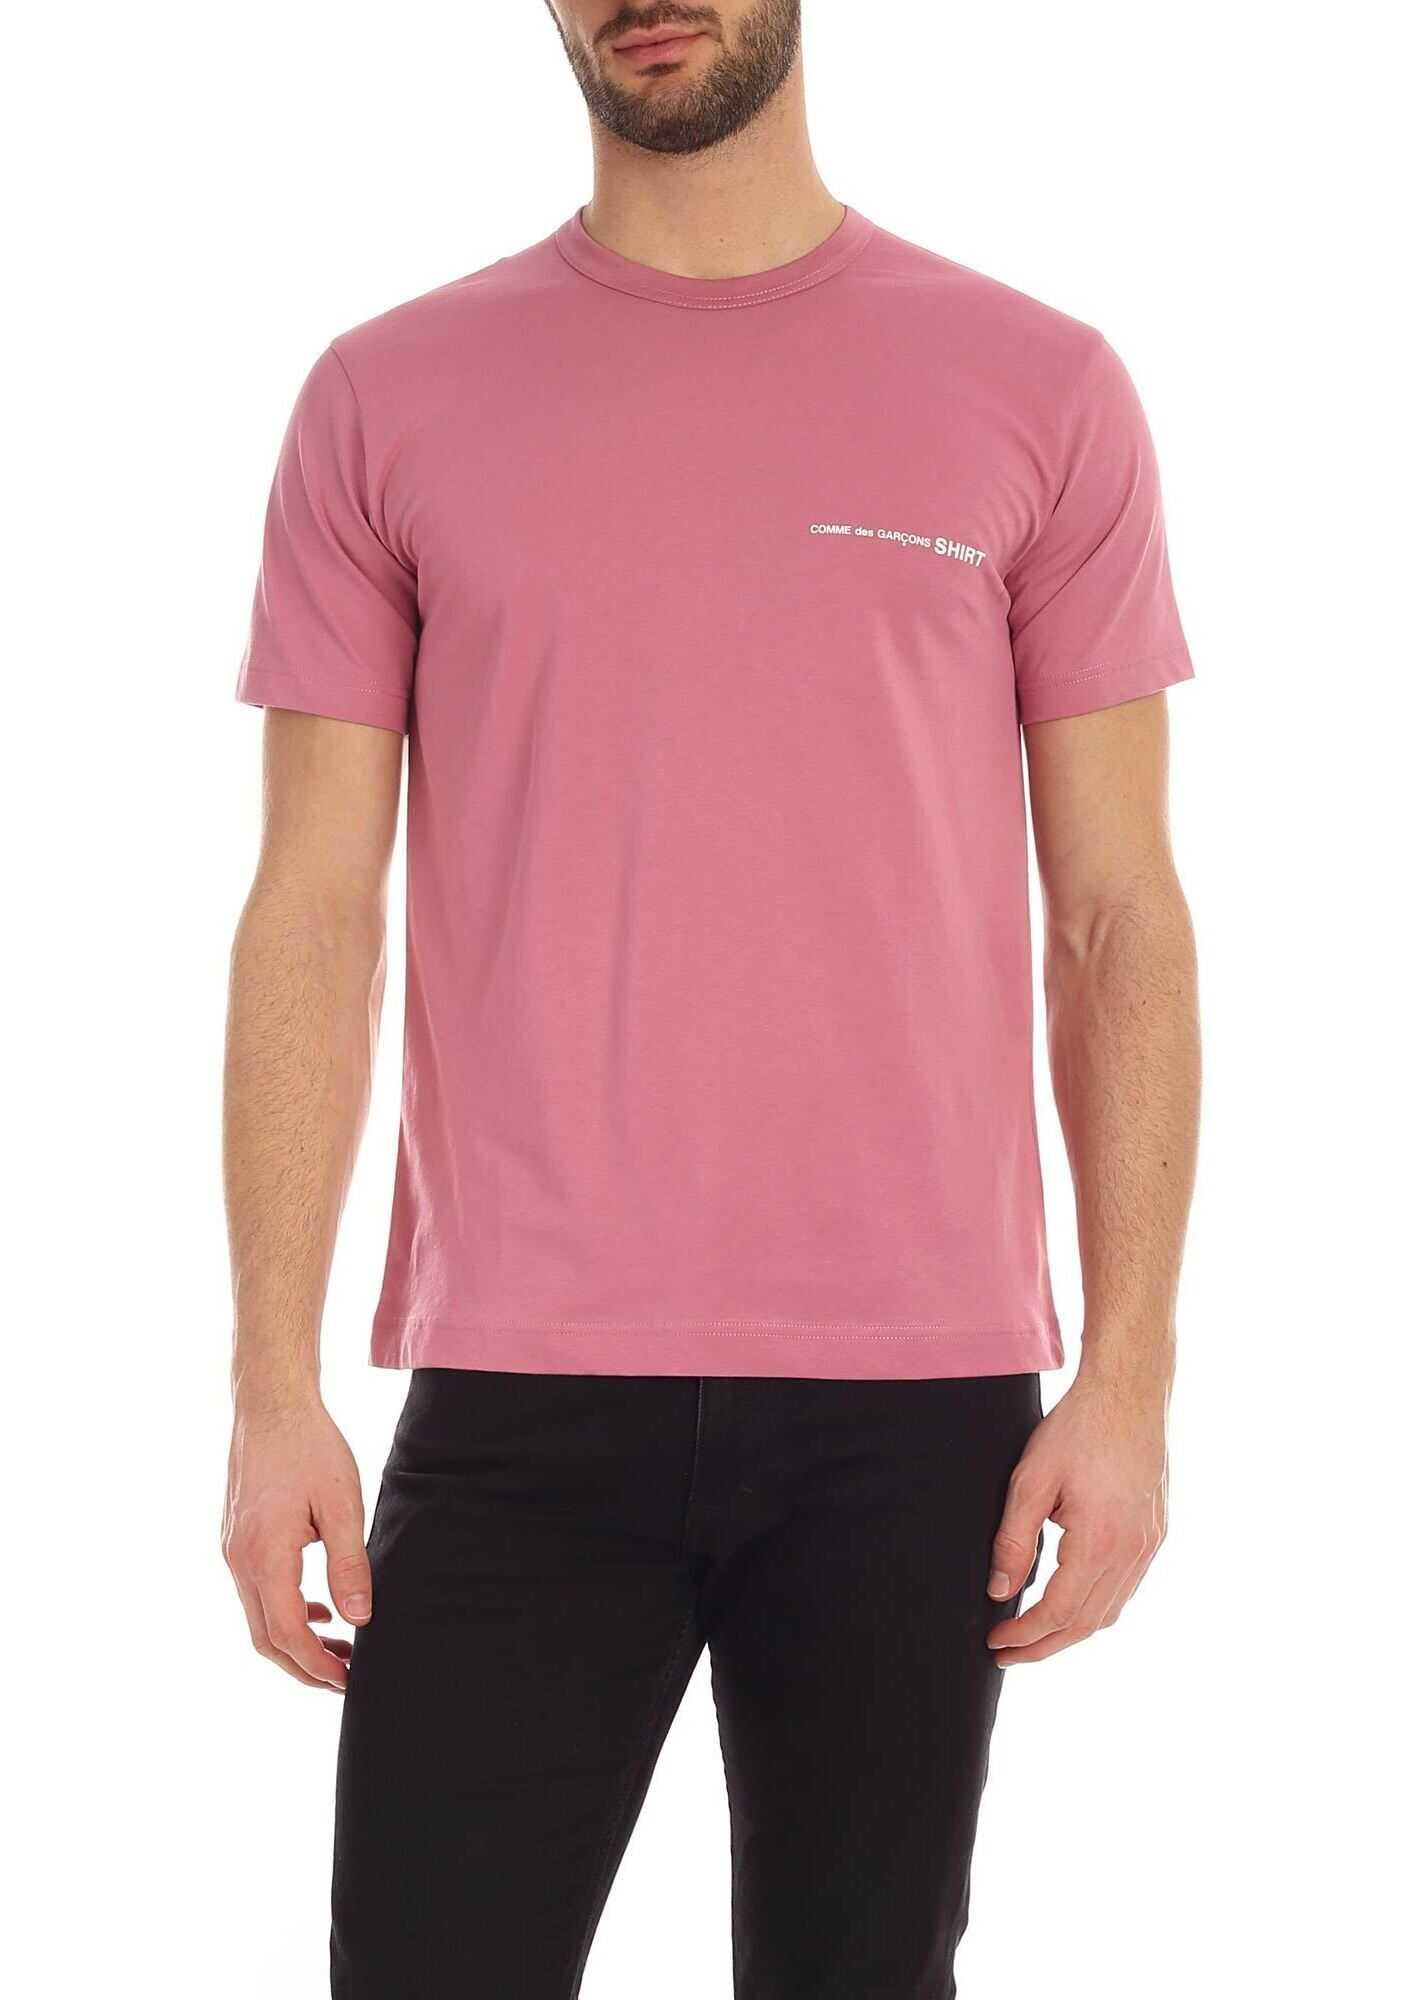 Comme des Garçons Logo Print T-Shirt In Pink Pink